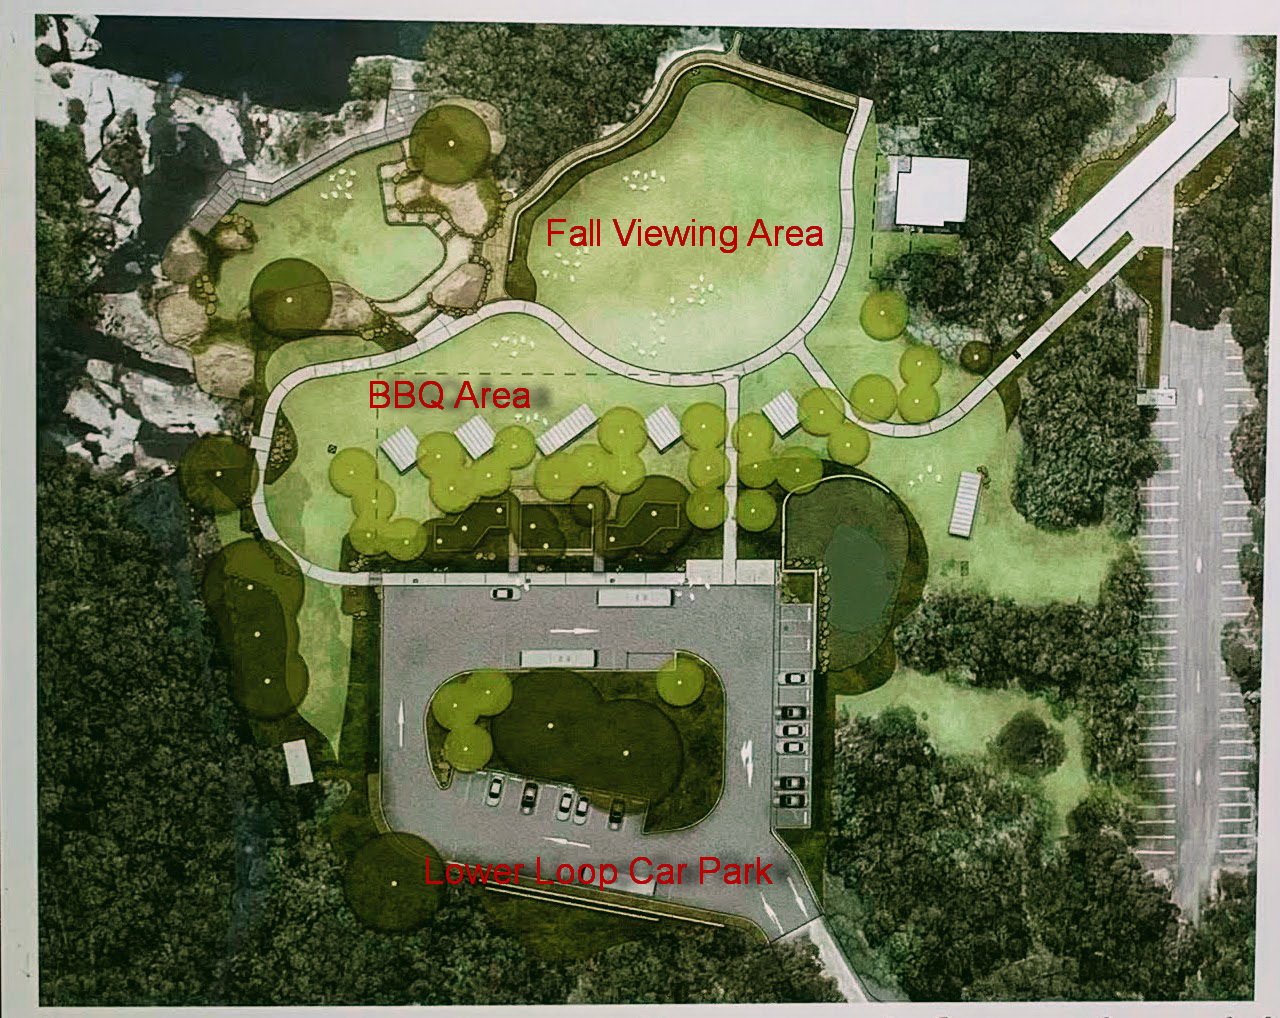 Wattamolla Upgrade Plan Map Explained